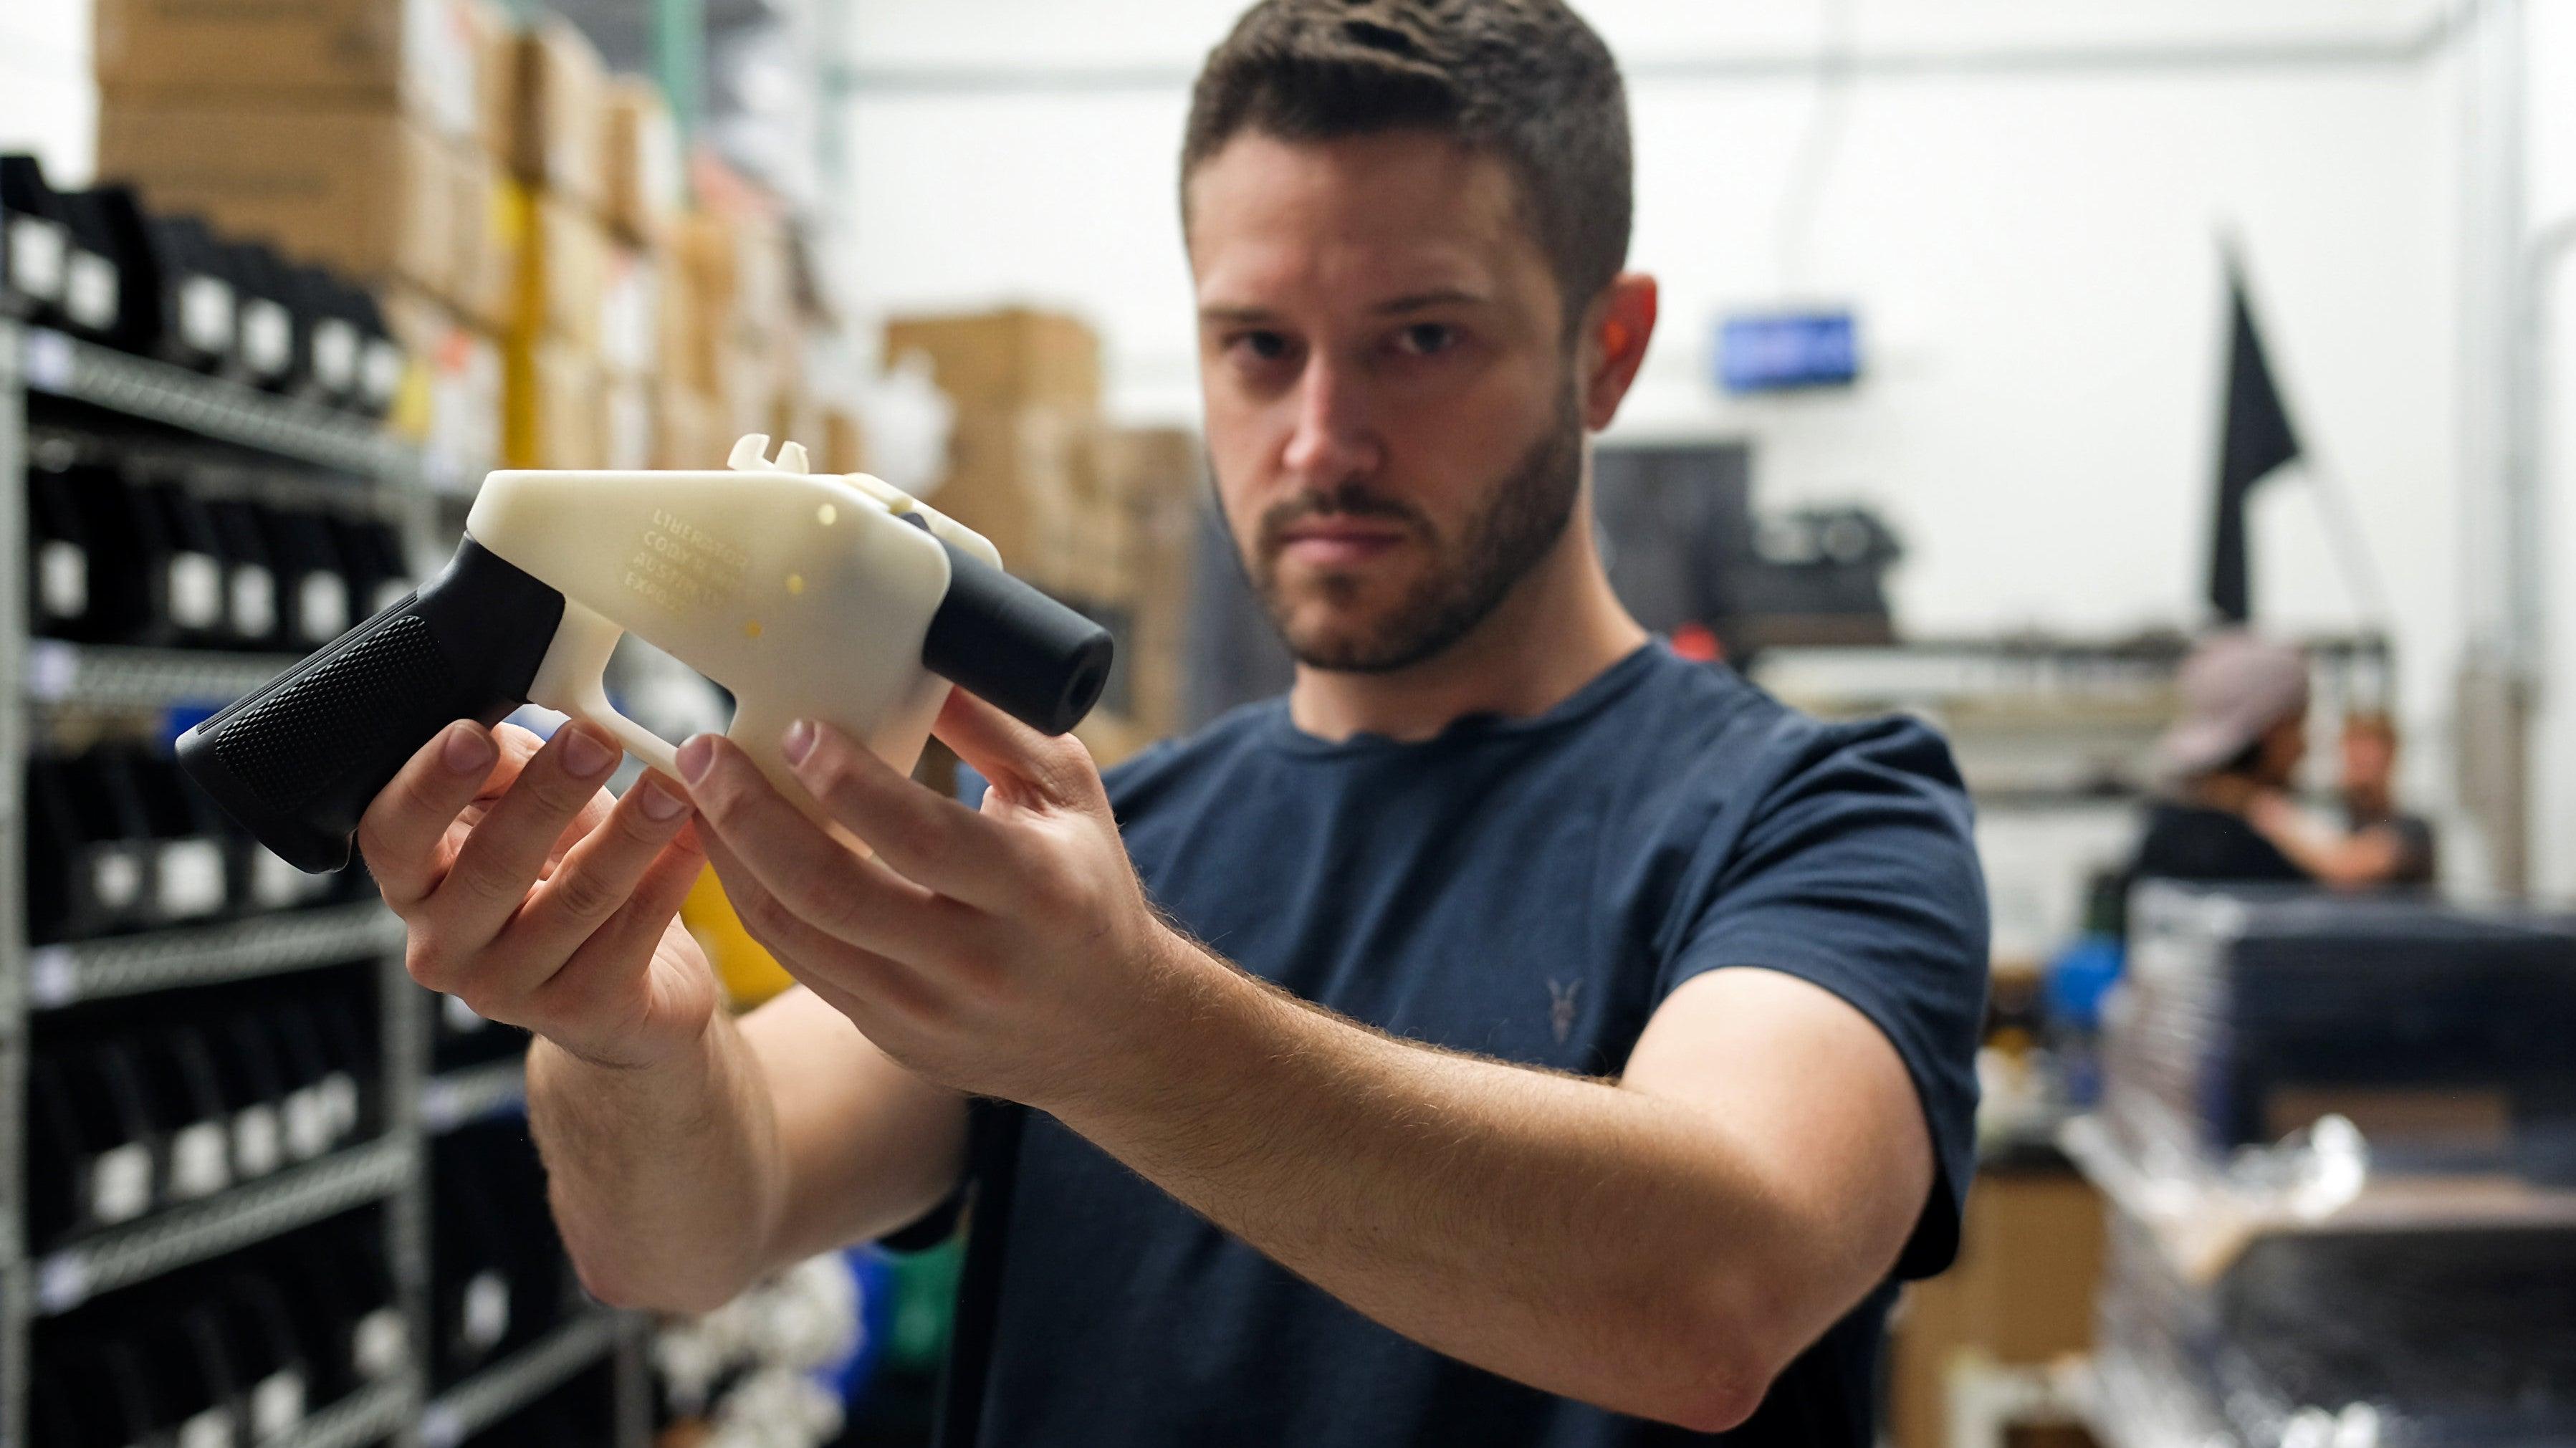 Judge Blocks Trump Administration From Allowing 3D-Printed Guns, Again